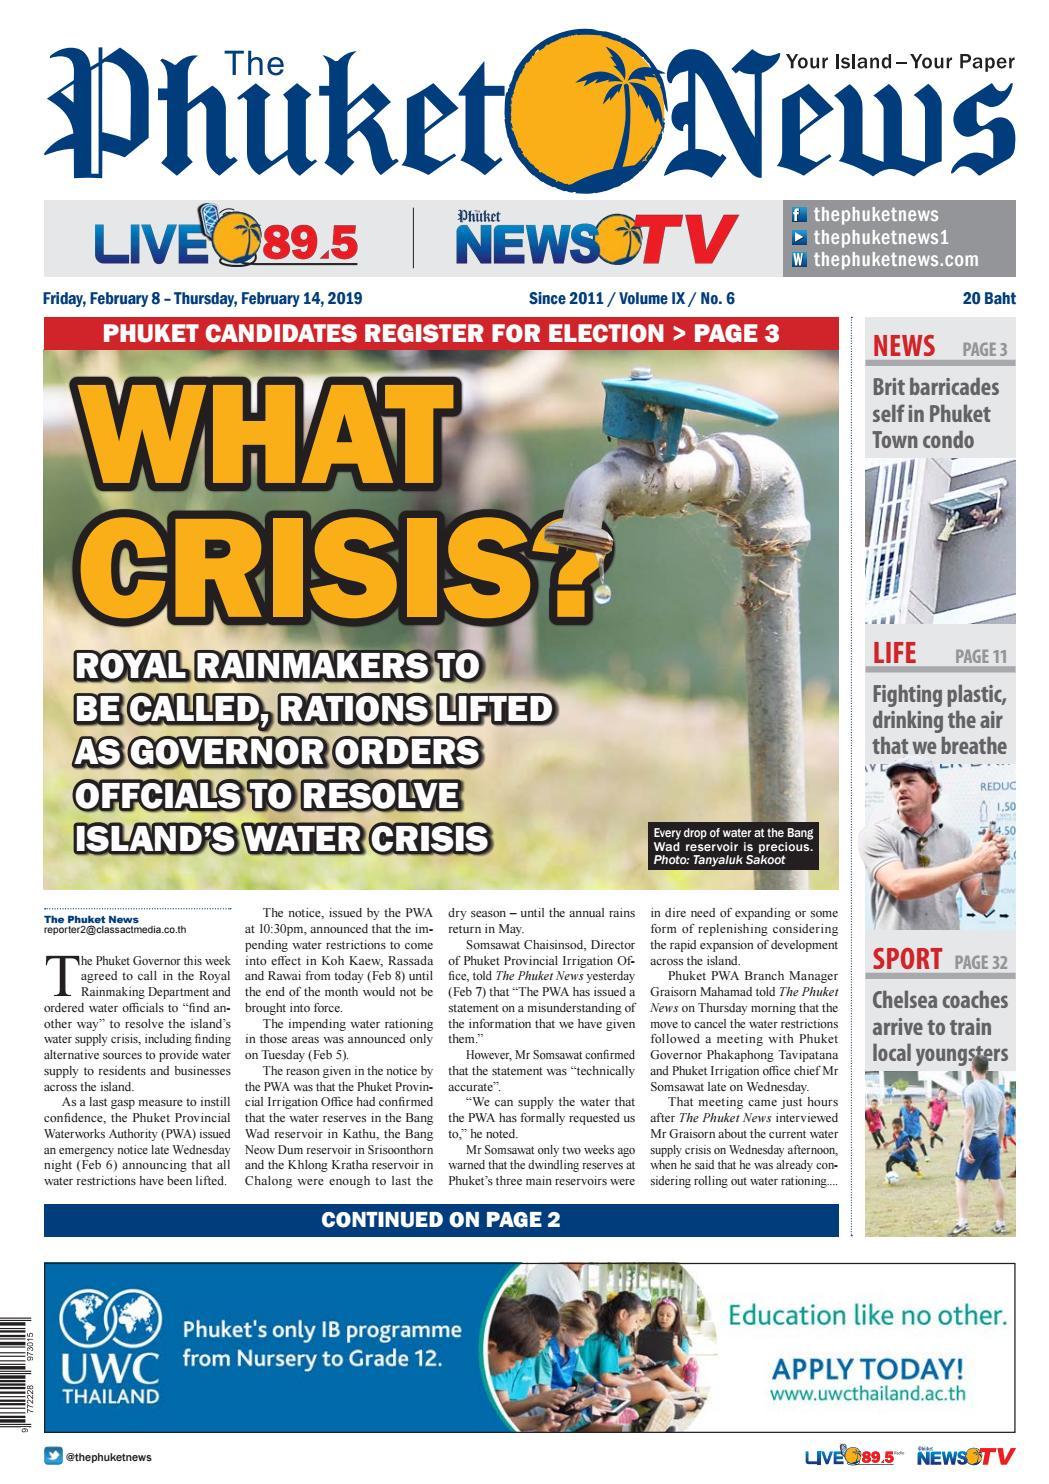 The Phuket News 08 February 2019 by The Phuket News - issuu